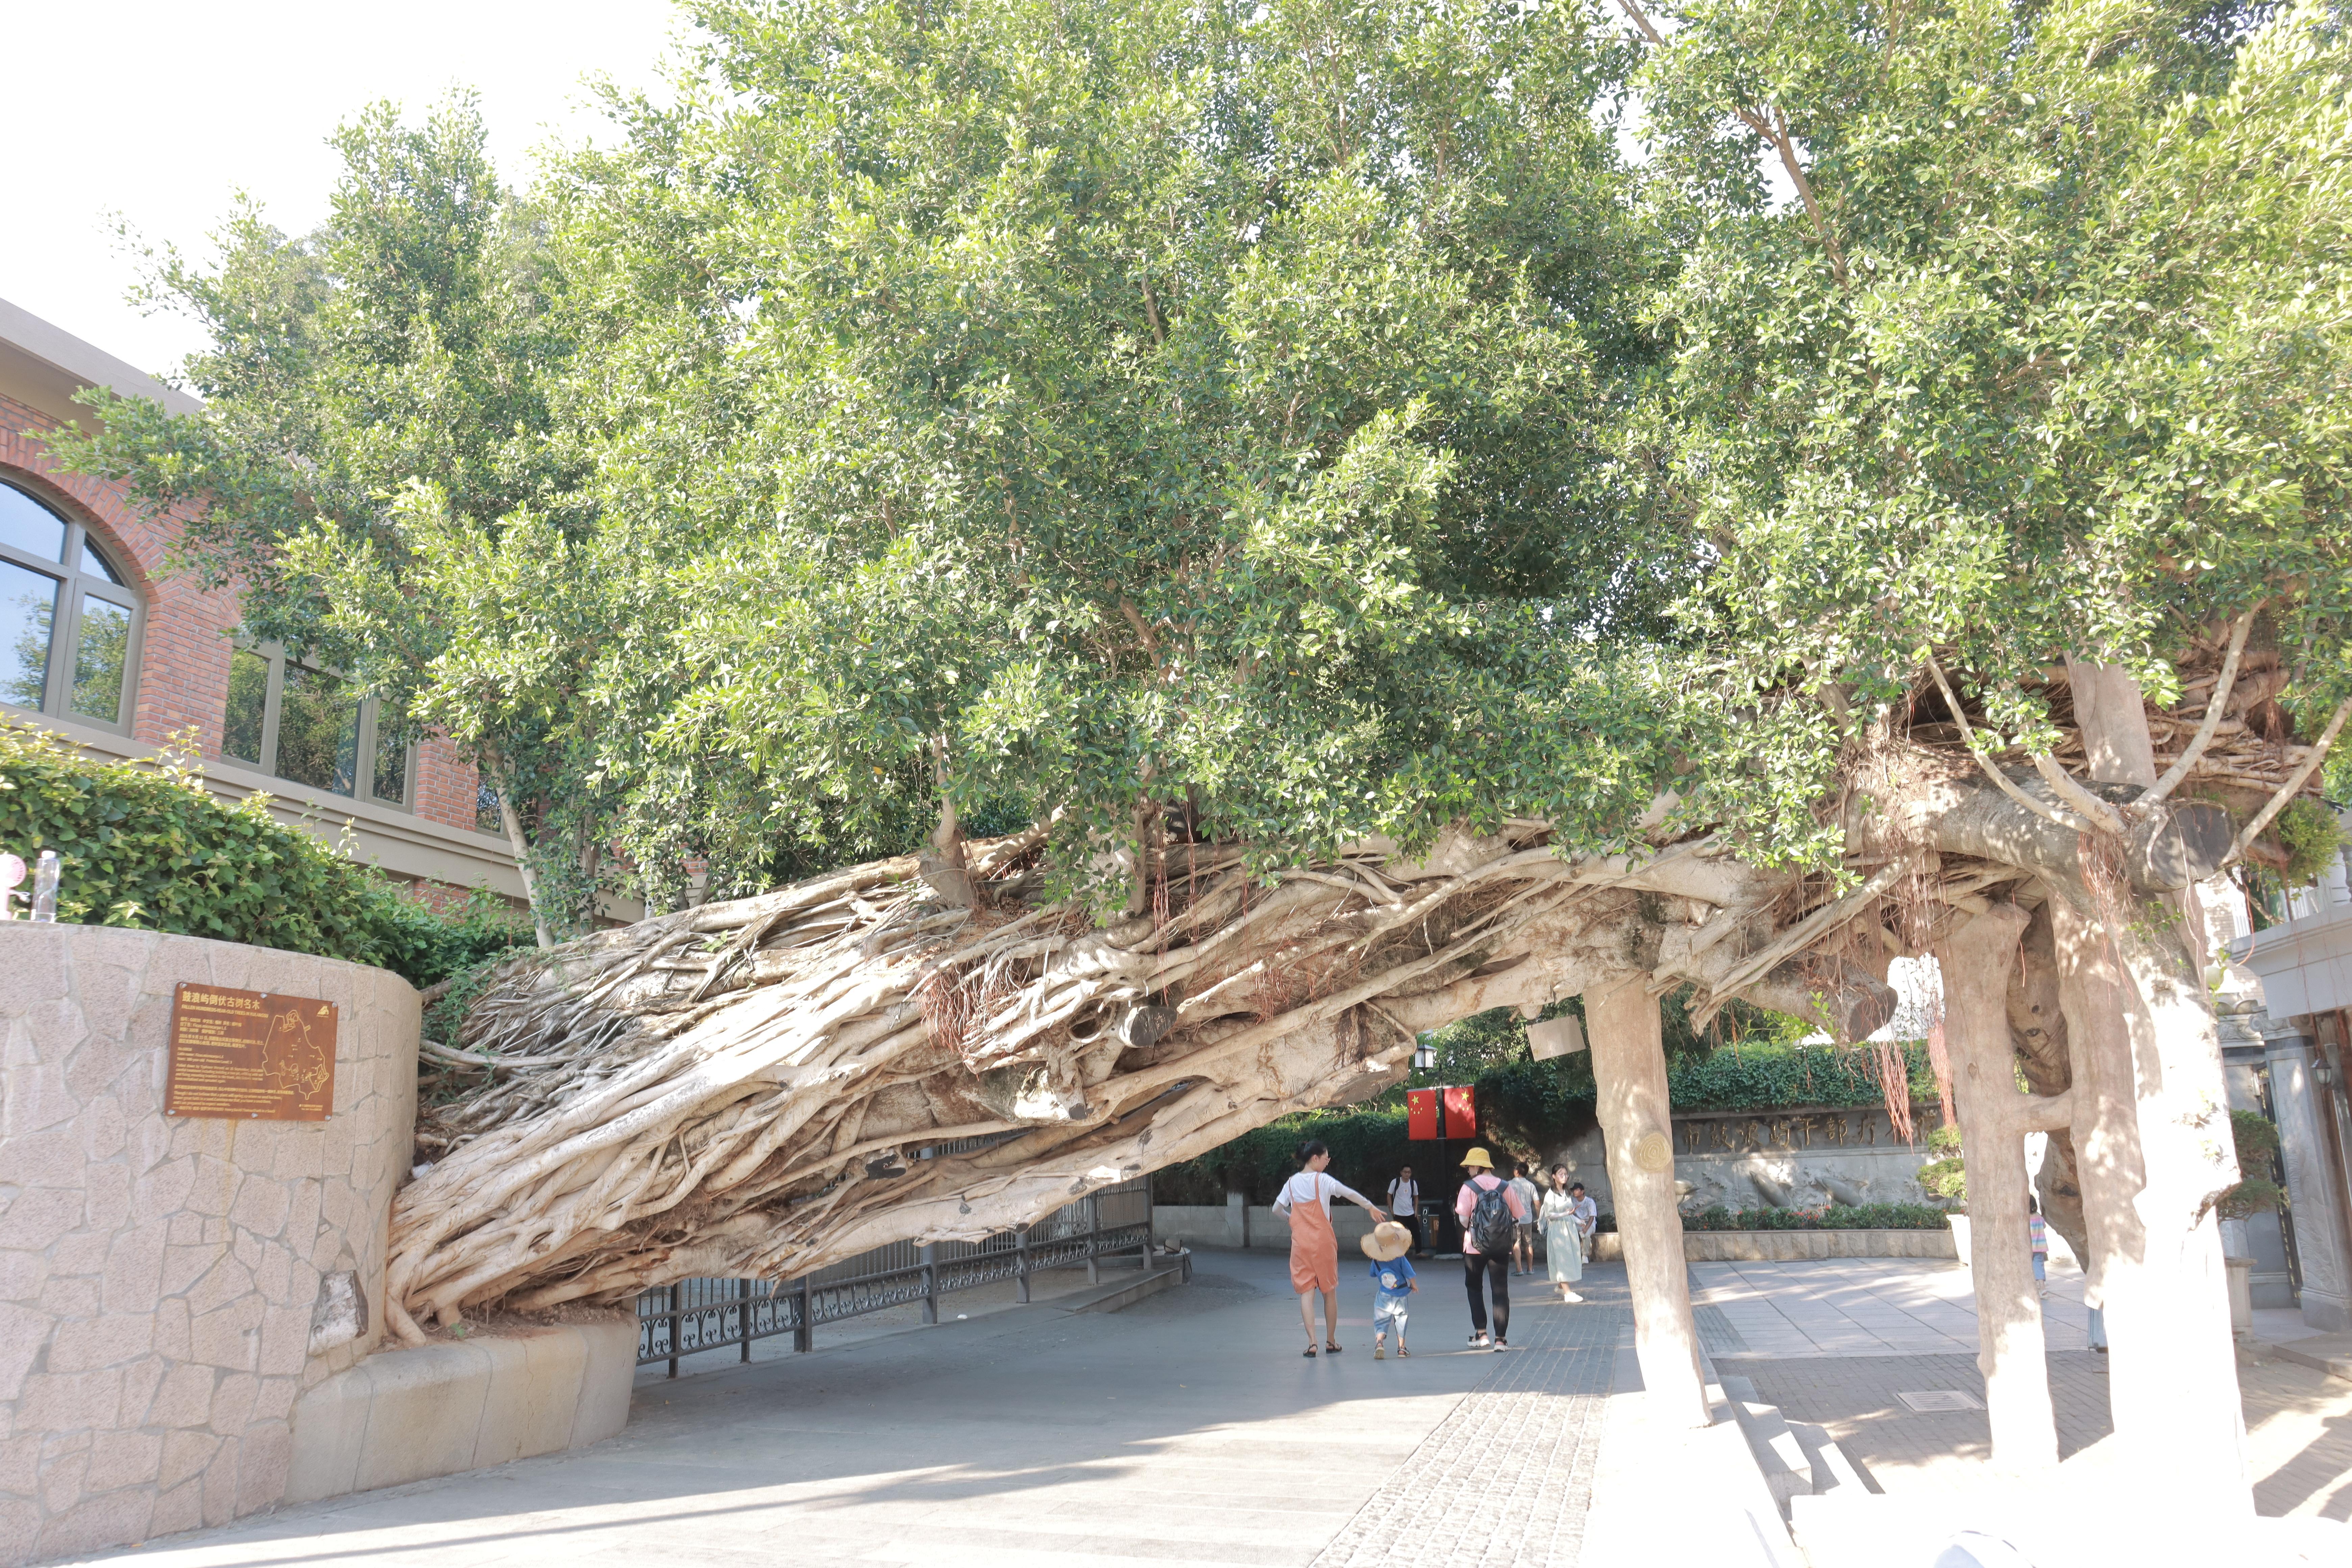 2016 Typhoon in China pulls down 200 year old tree, Captured in Kulangsu, Xiamen